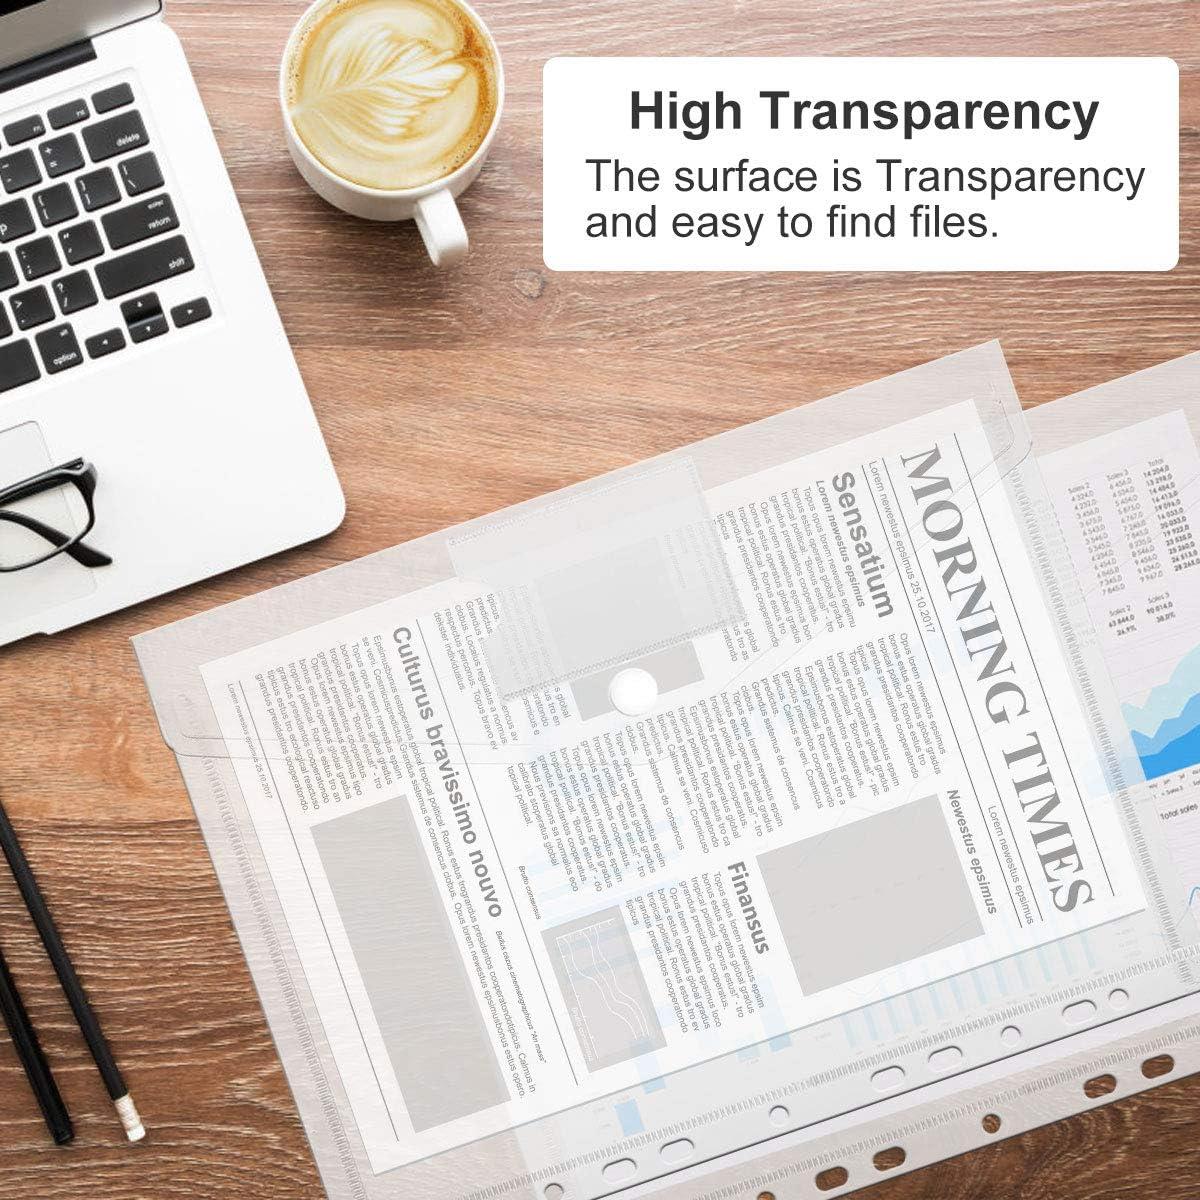 Carpetas Para Archivo A4 Portafolios de Pl/ástico con Bot/ón para Documentos Recibos Oficina y Escolar Samione 20Pcs Bolsa de Documentos de Transparentes Certificados